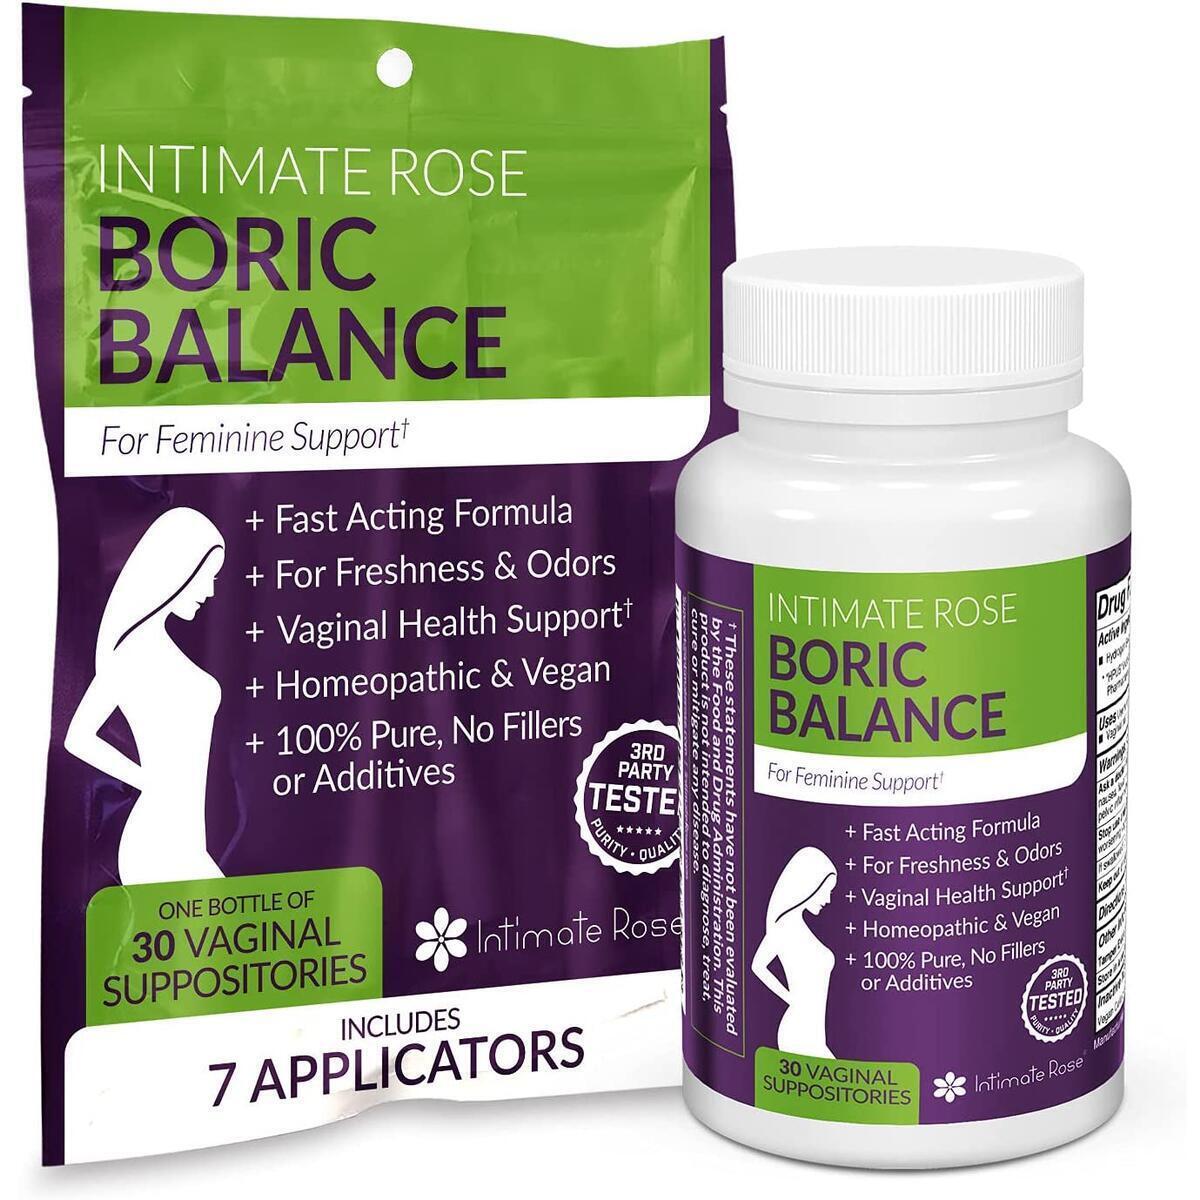 Boric Acid Vaginal Suppositories - 30 BV Treatments + 7 Applicators